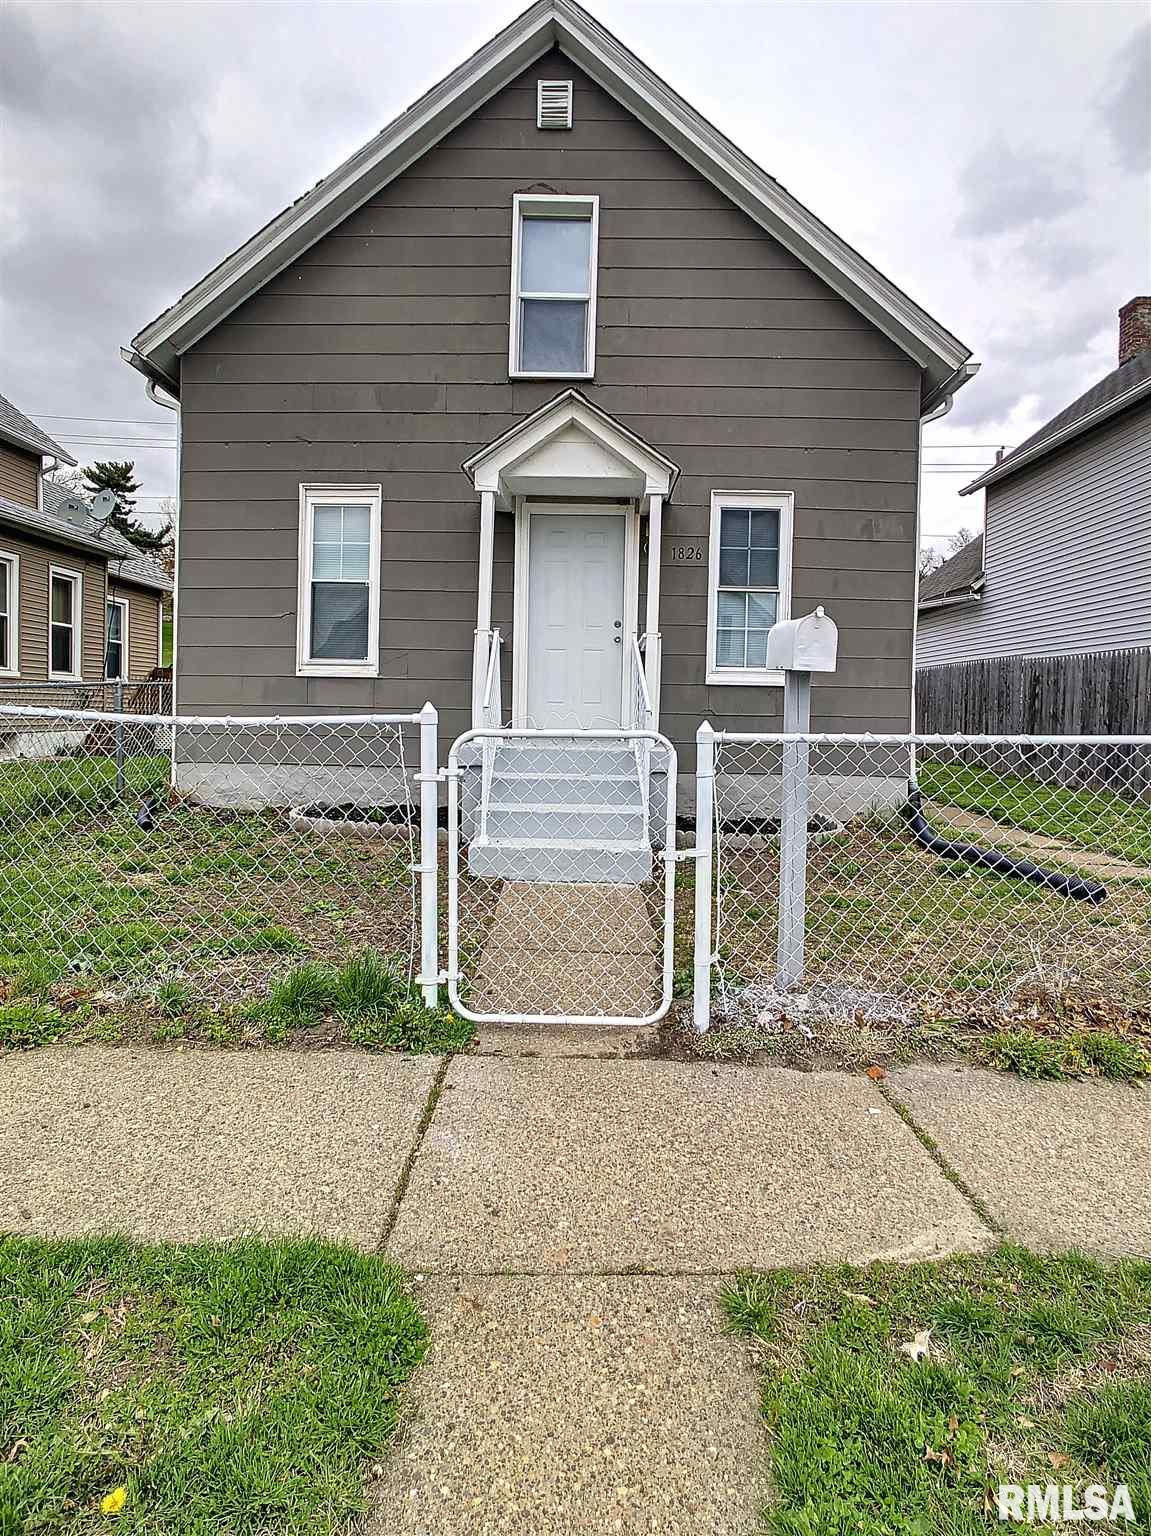 1826 W 8TH Property Photo - Davenport, IA real estate listing